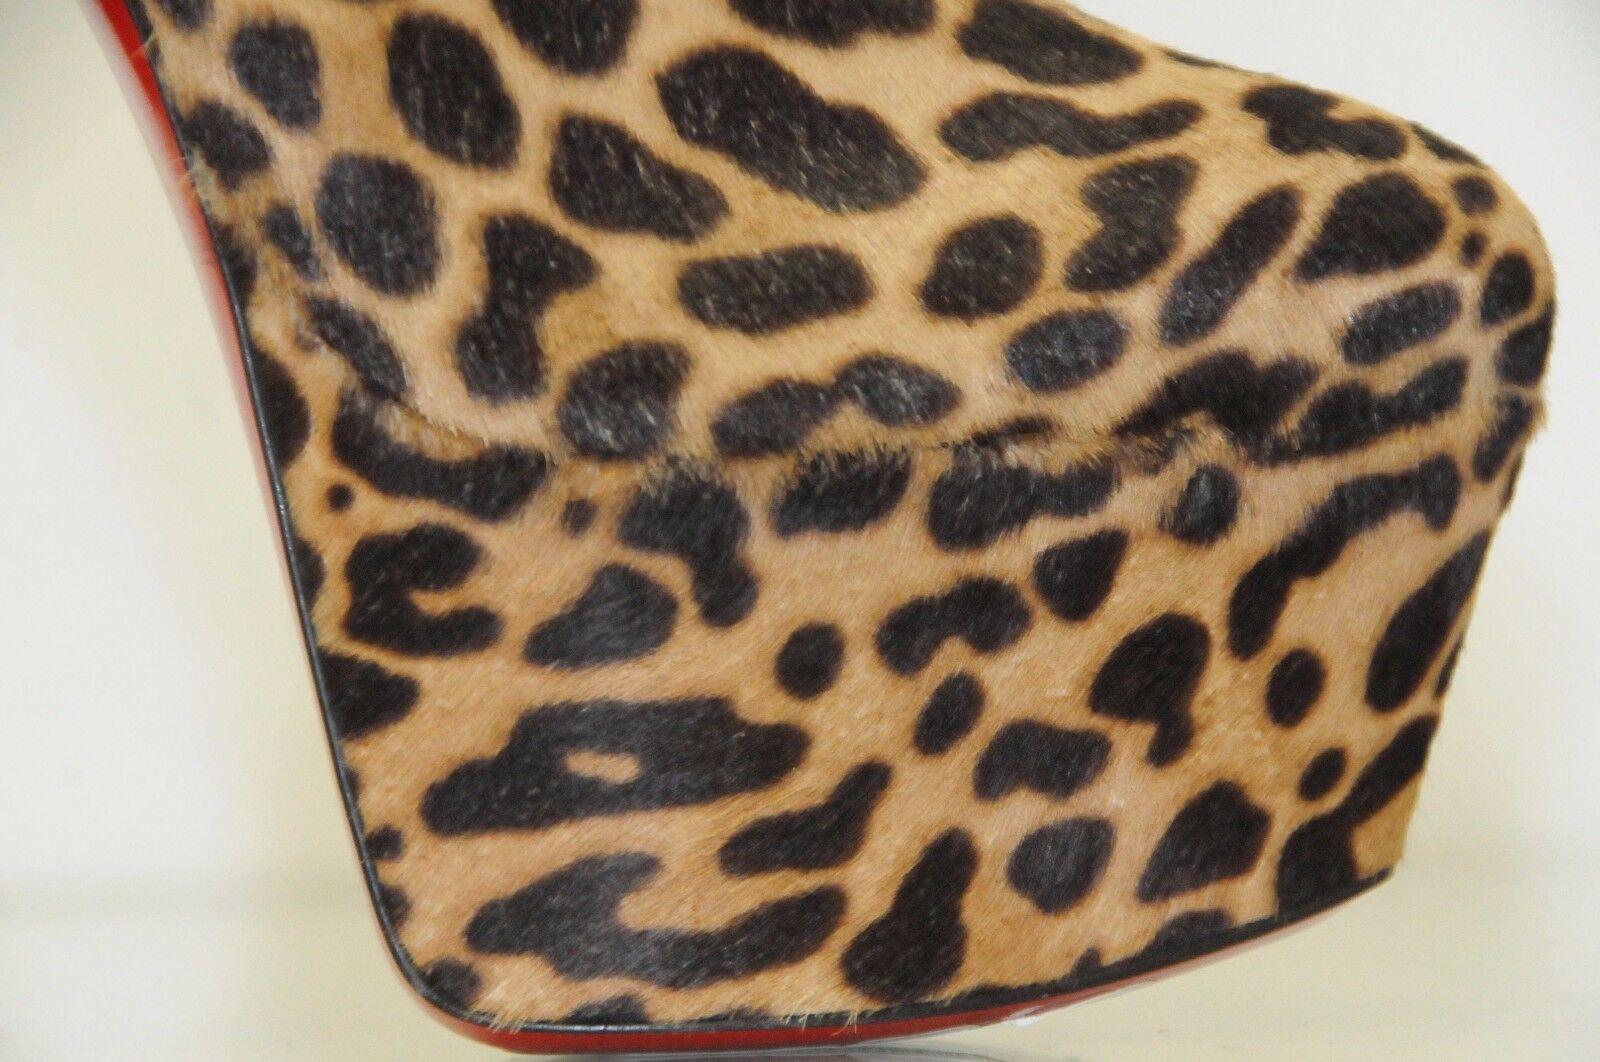 Nuevo Pony Christian Louboutin Feroz Leopardo Pony Nuevo Jaguar botas de Plataforma 37 38 2a94f4